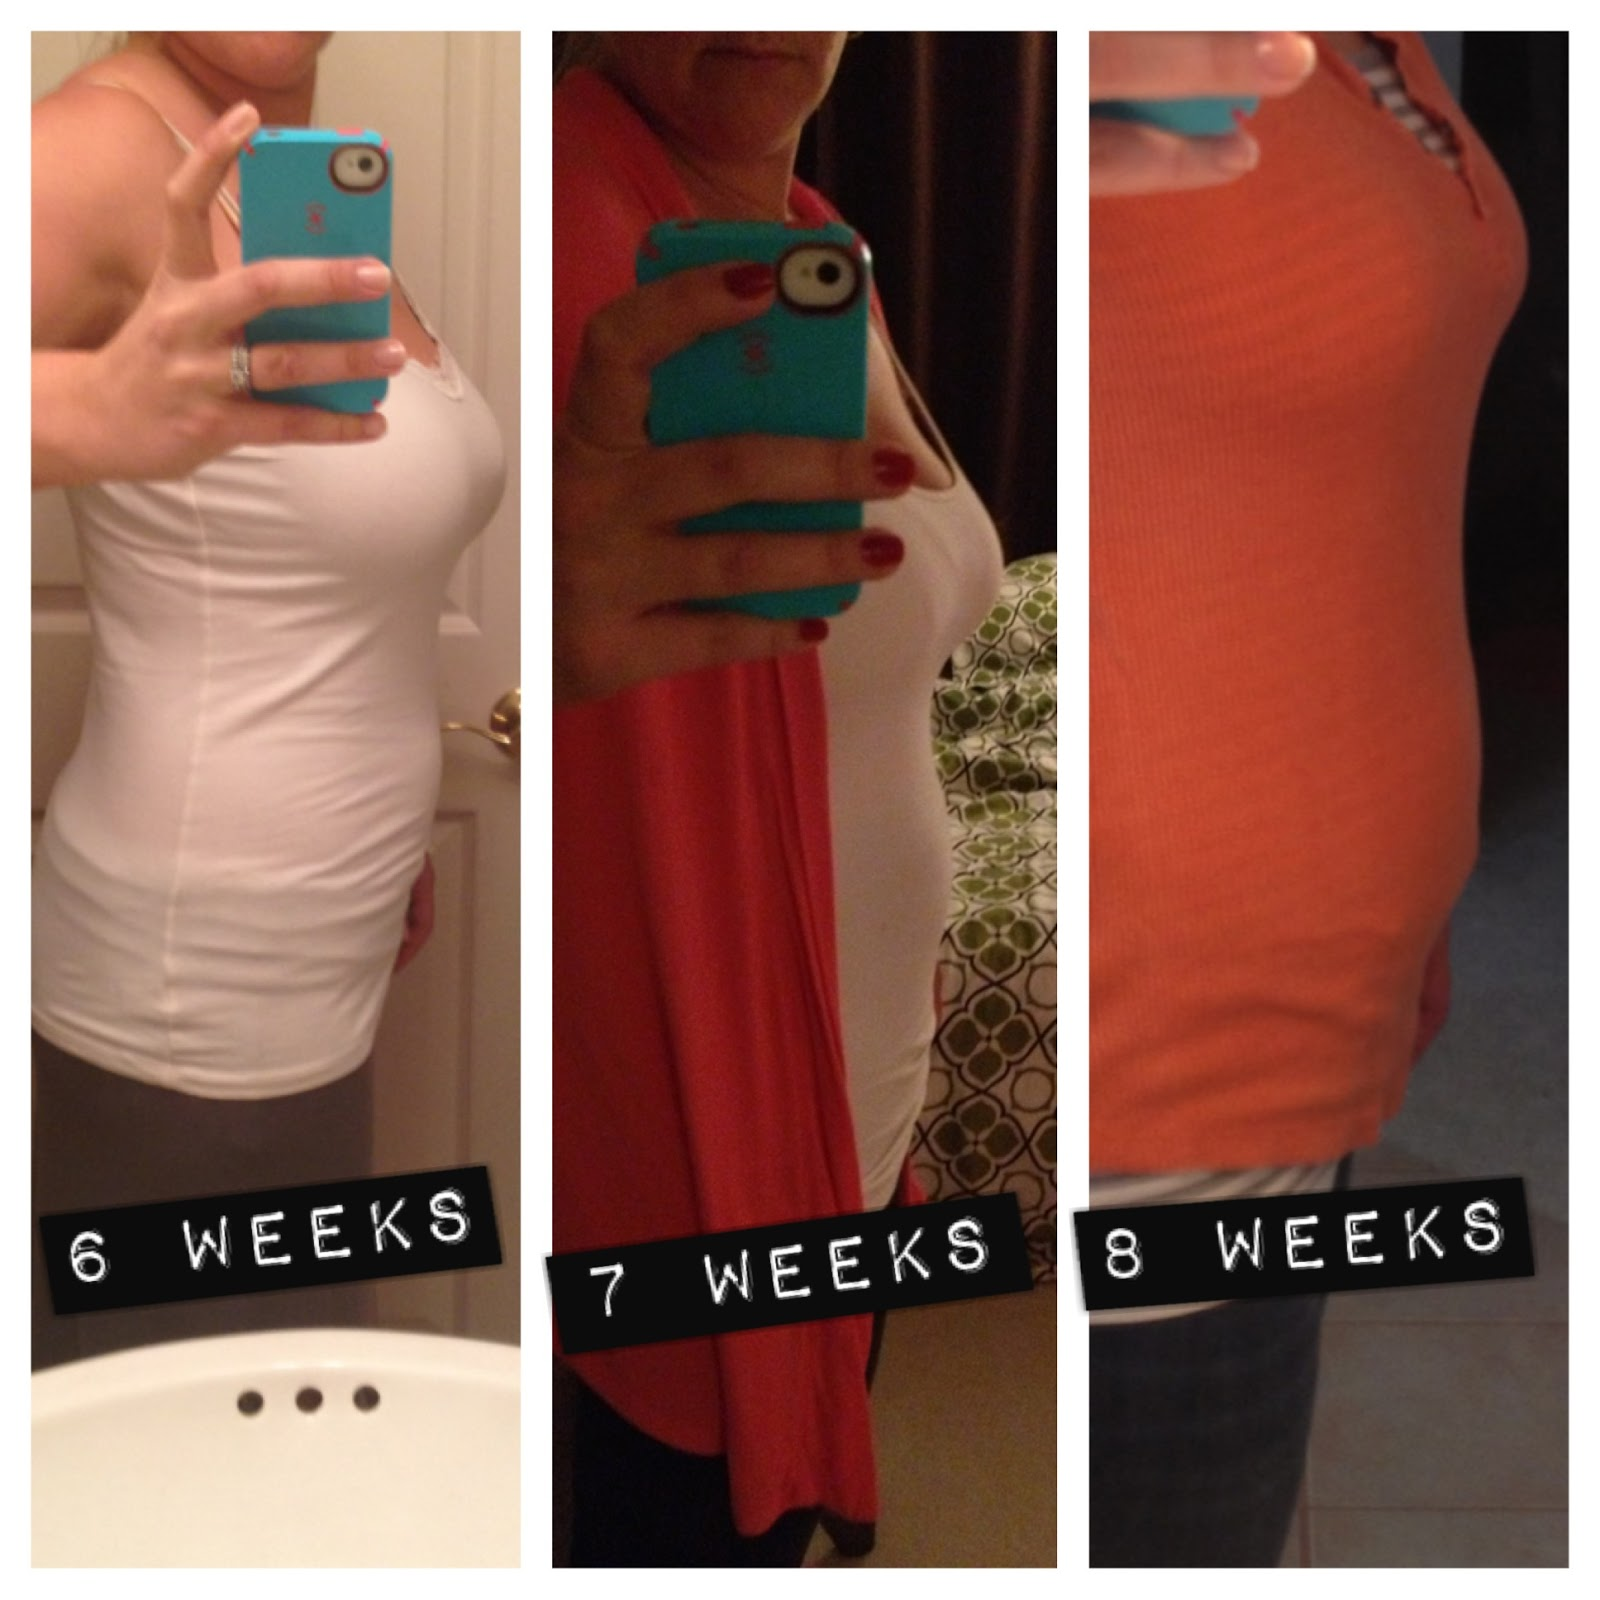 Our Fiesta of Five: 12 weeks  Early Pregnancy Stomach 3 Weeks